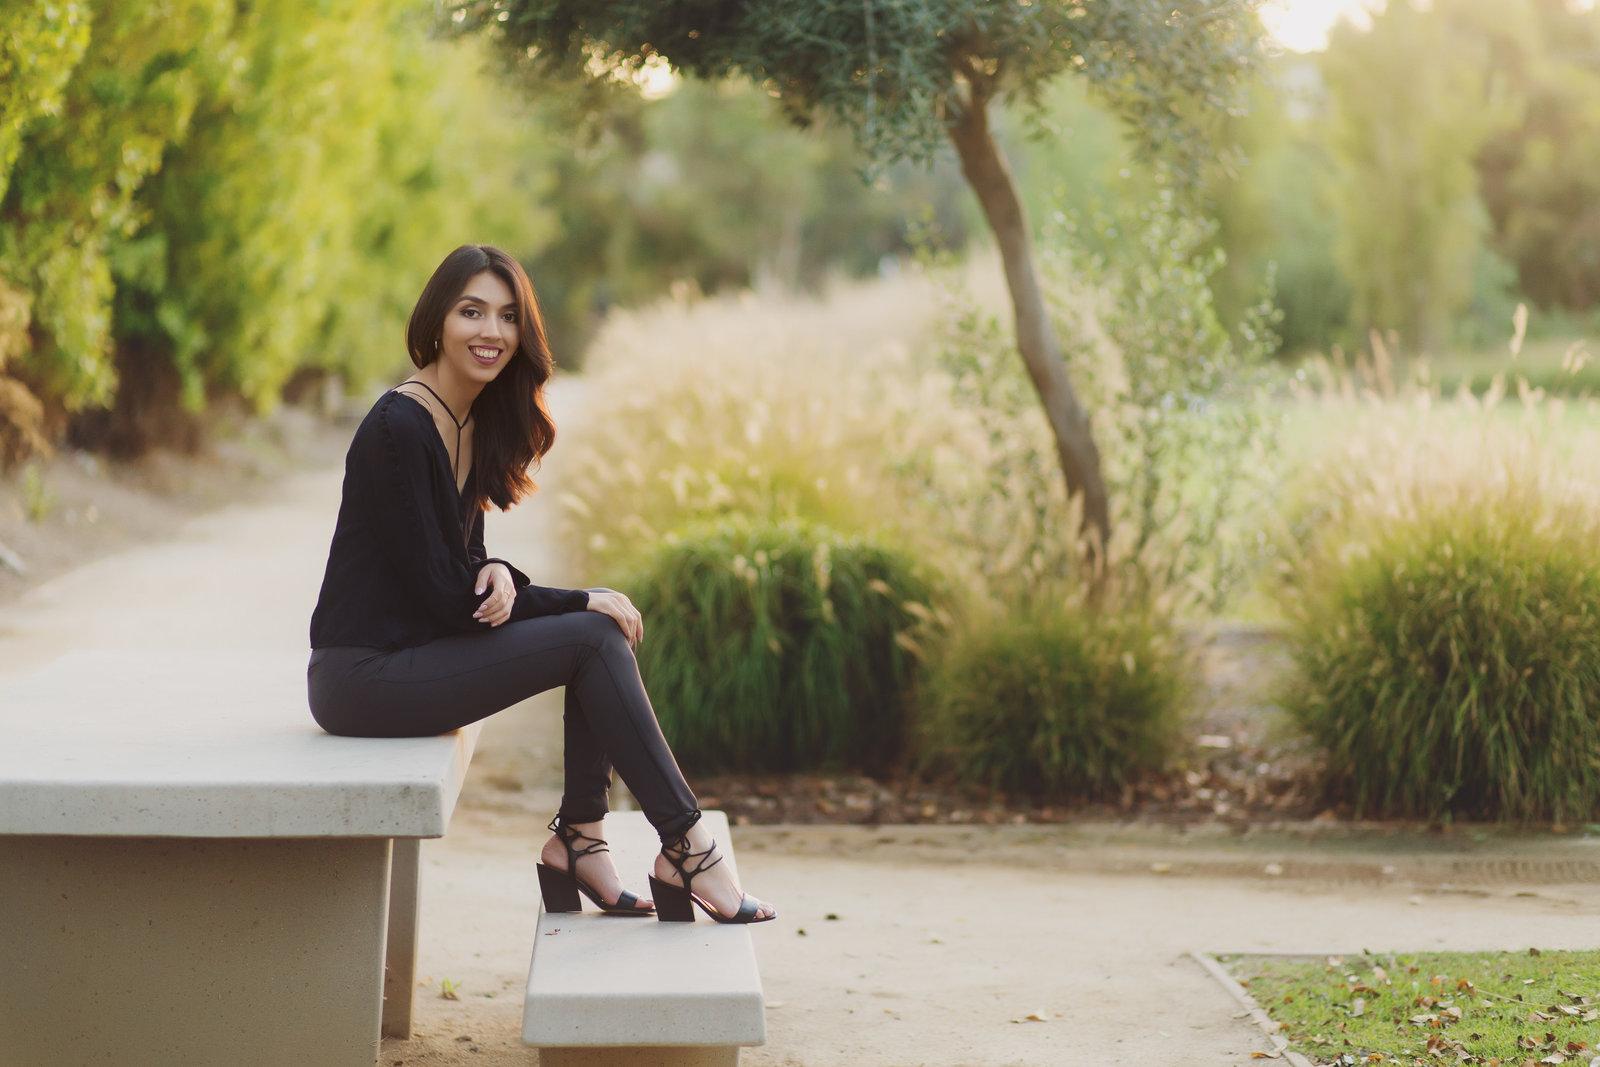 San_Diego_Professional_Portraits_Headshots_I_and_L_Photography-003